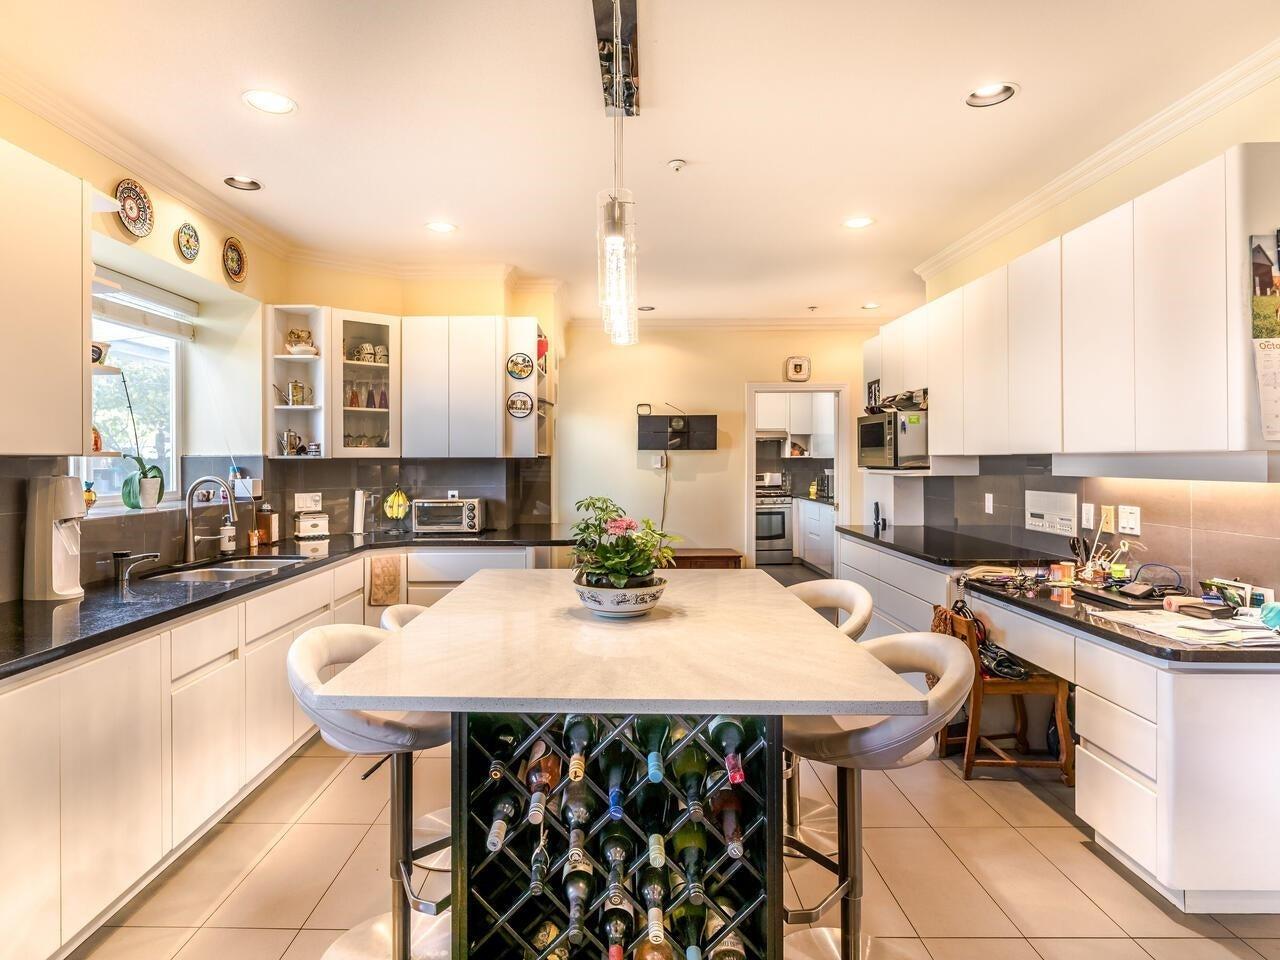 7888 JASPER CRESCENT - Fraserview VE House/Single Family for sale, 7 Bedrooms (R2622945) - #8